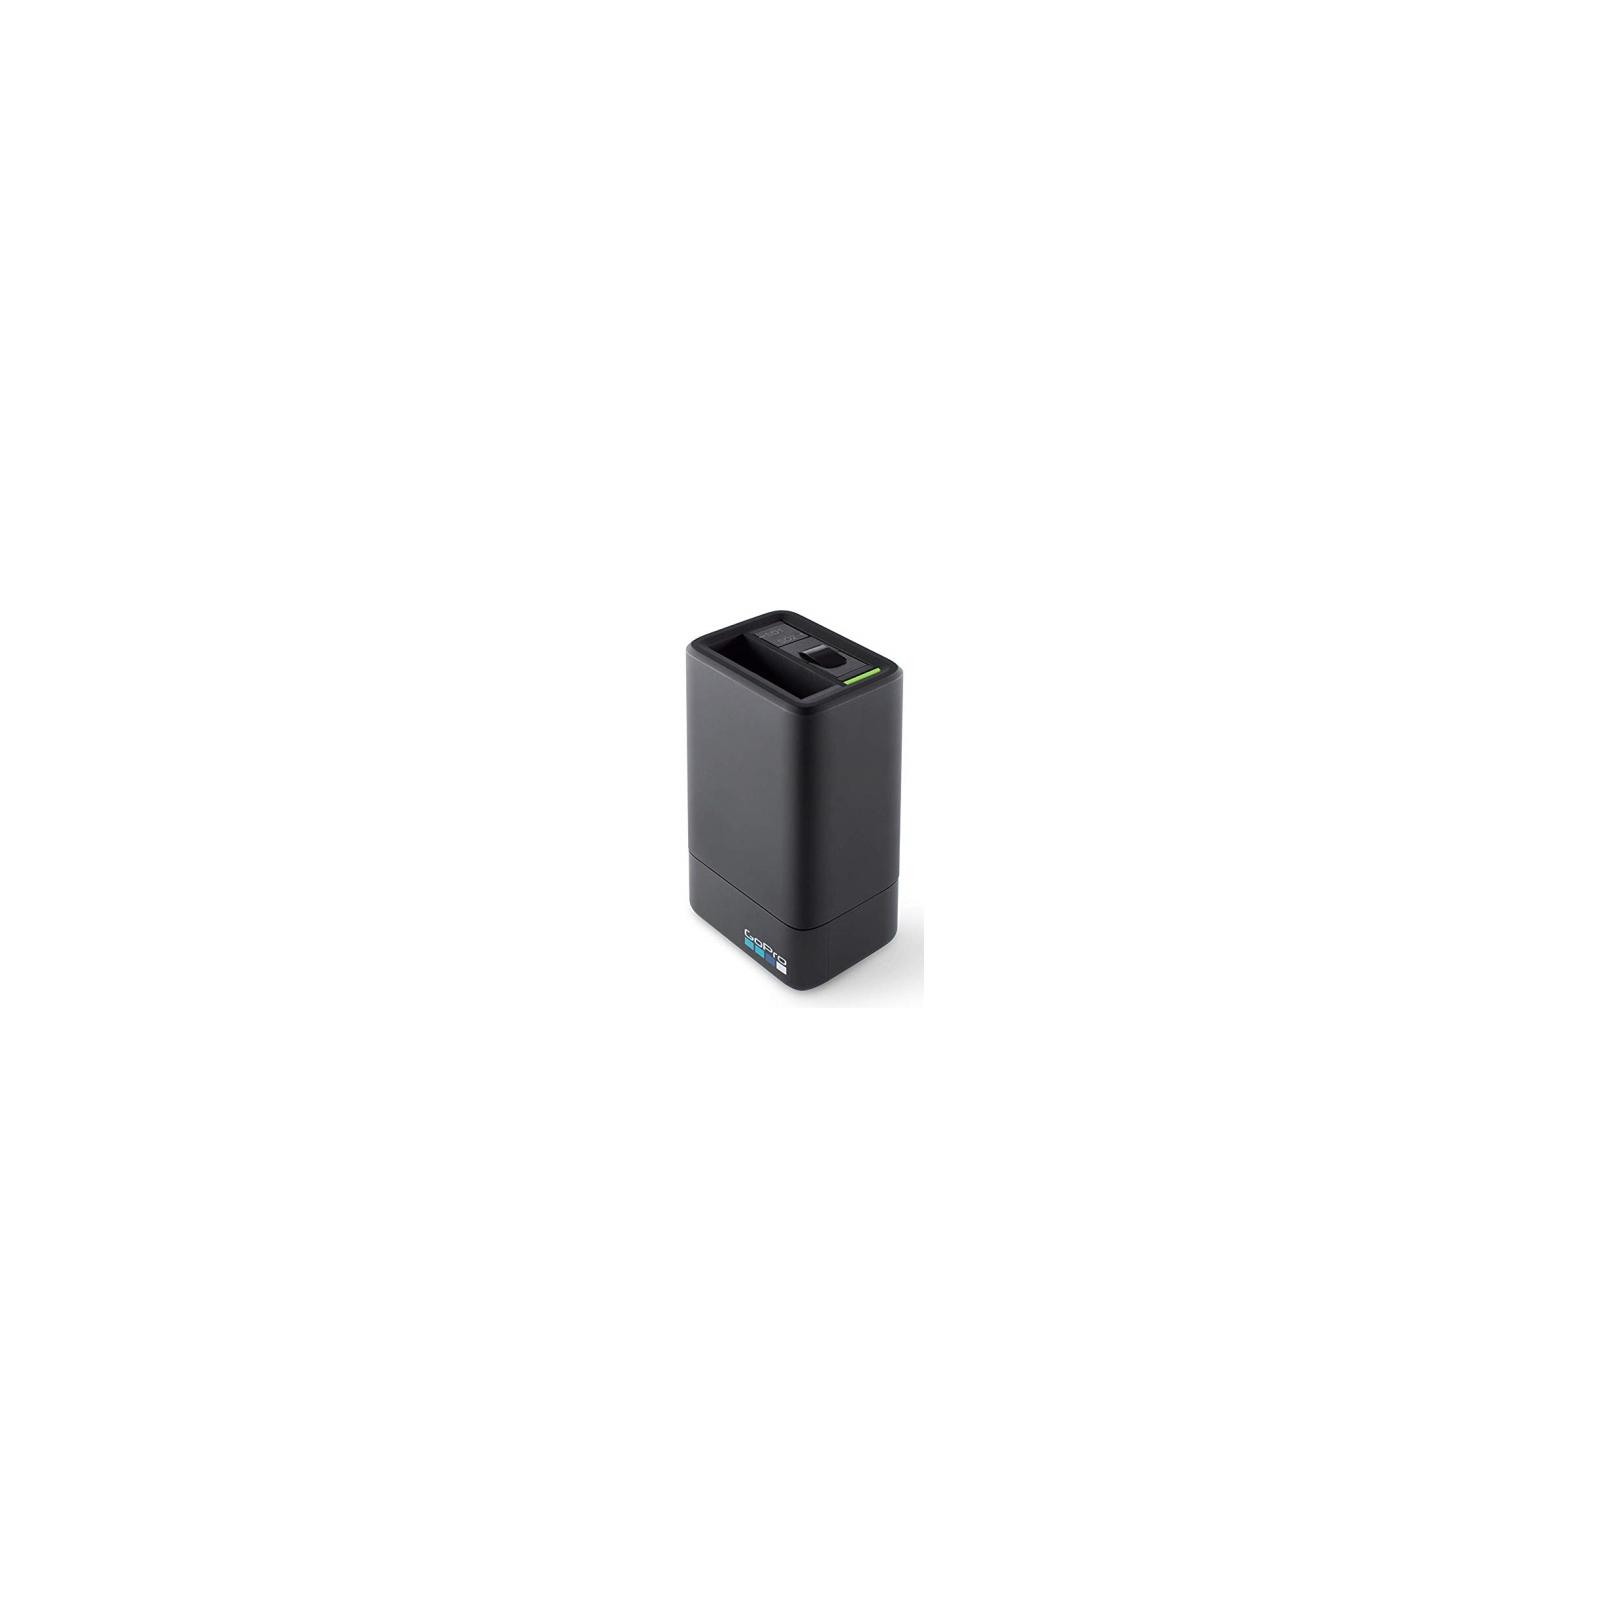 Аксессуар к экшн-камерам GoPro Fusion Dual Battery Charger + Battery (ASDBC-001-EU) изображение 3